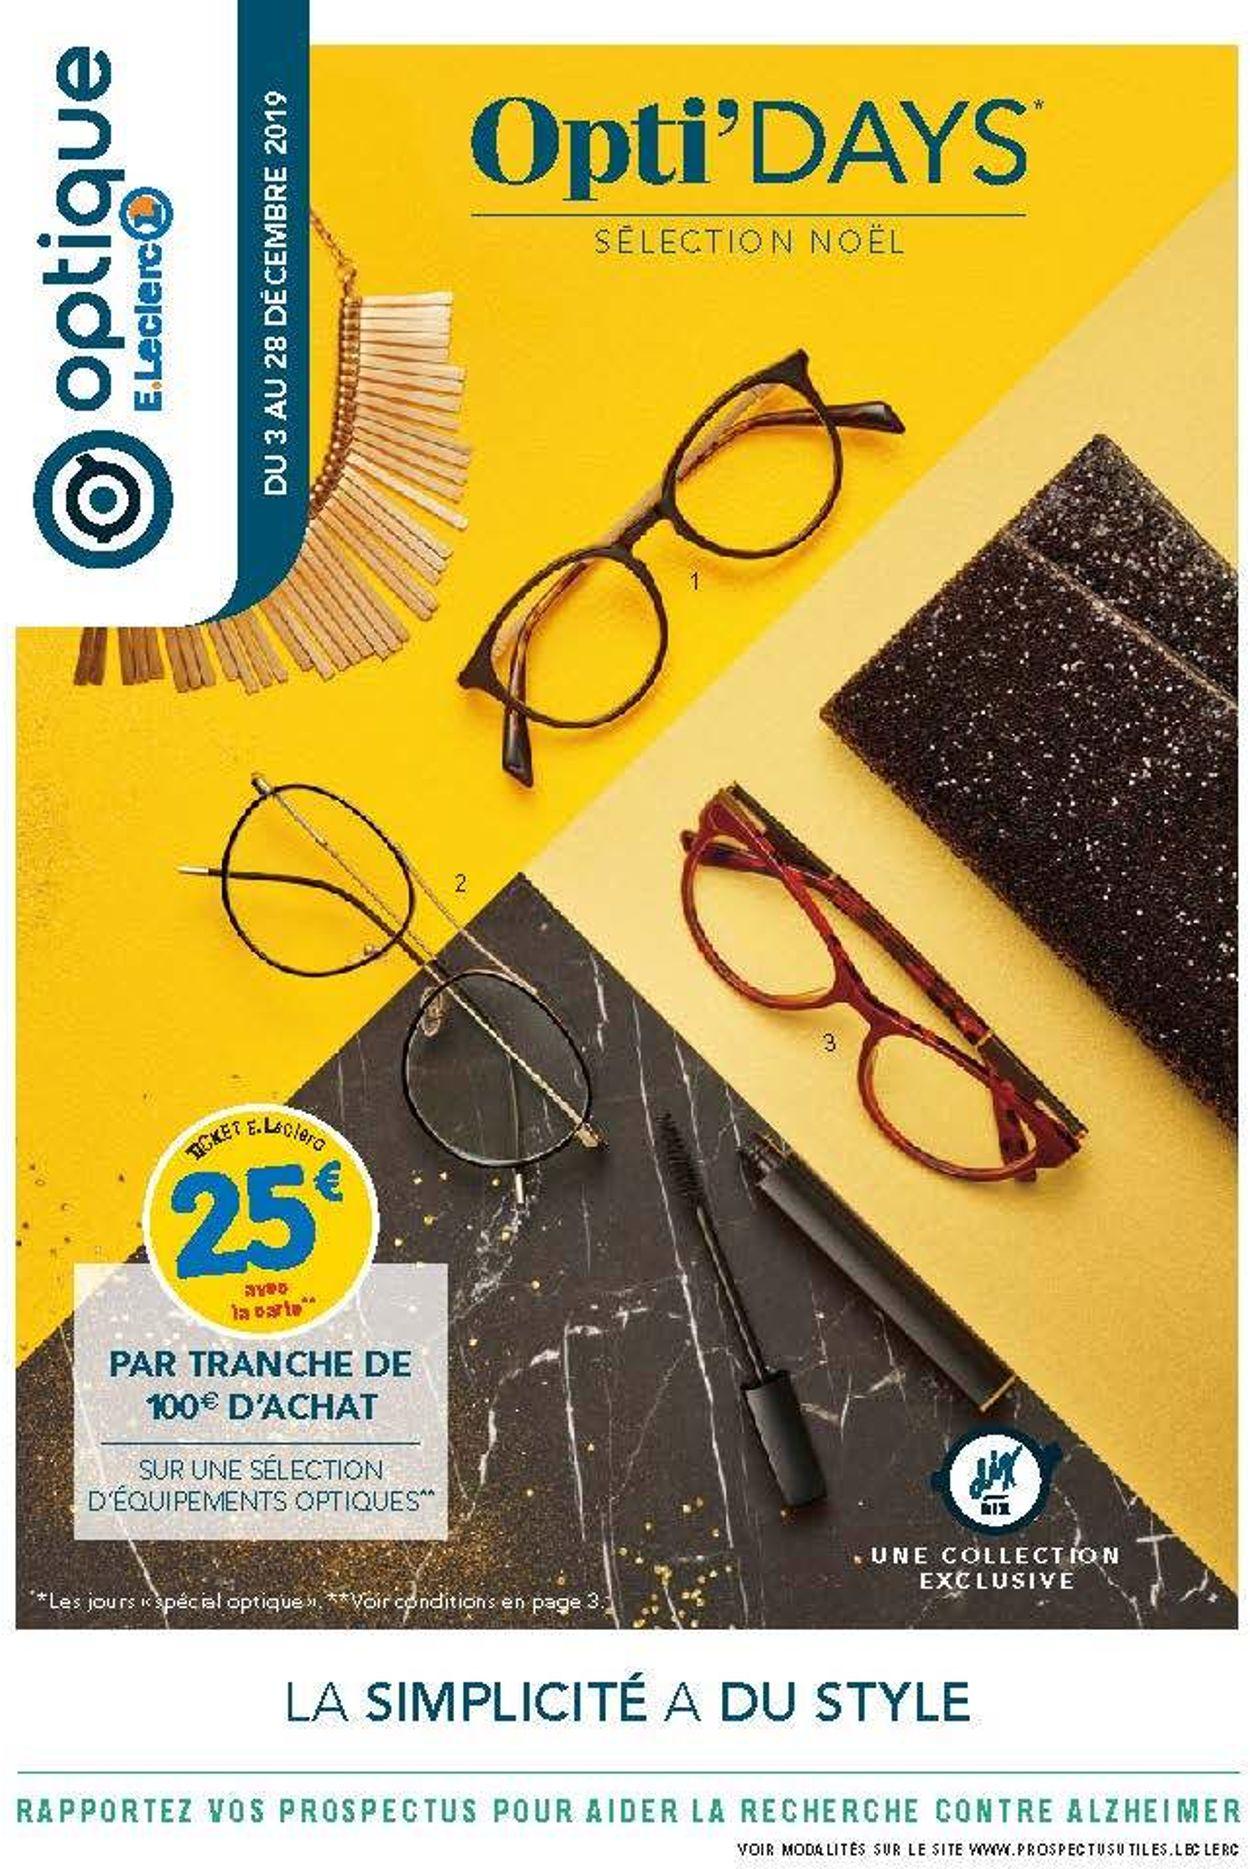 E.leclerc Catalogue - 03.12-28.12.2019